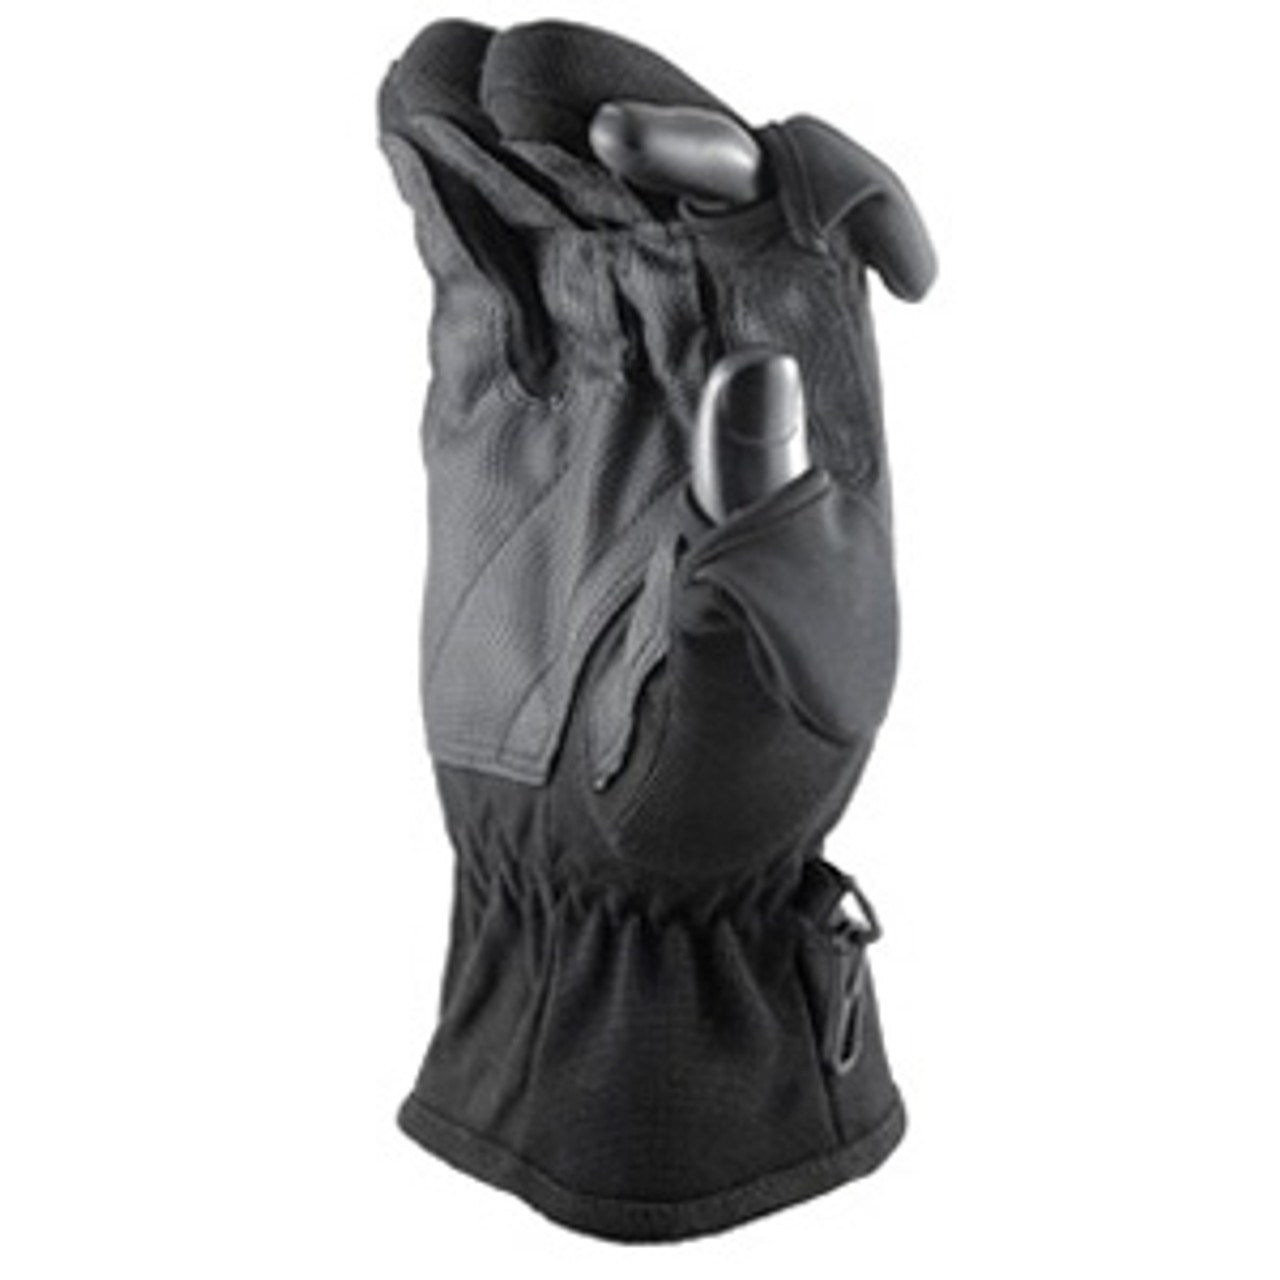 Optex Freehands Photo Gloves - Ladies (Medium)